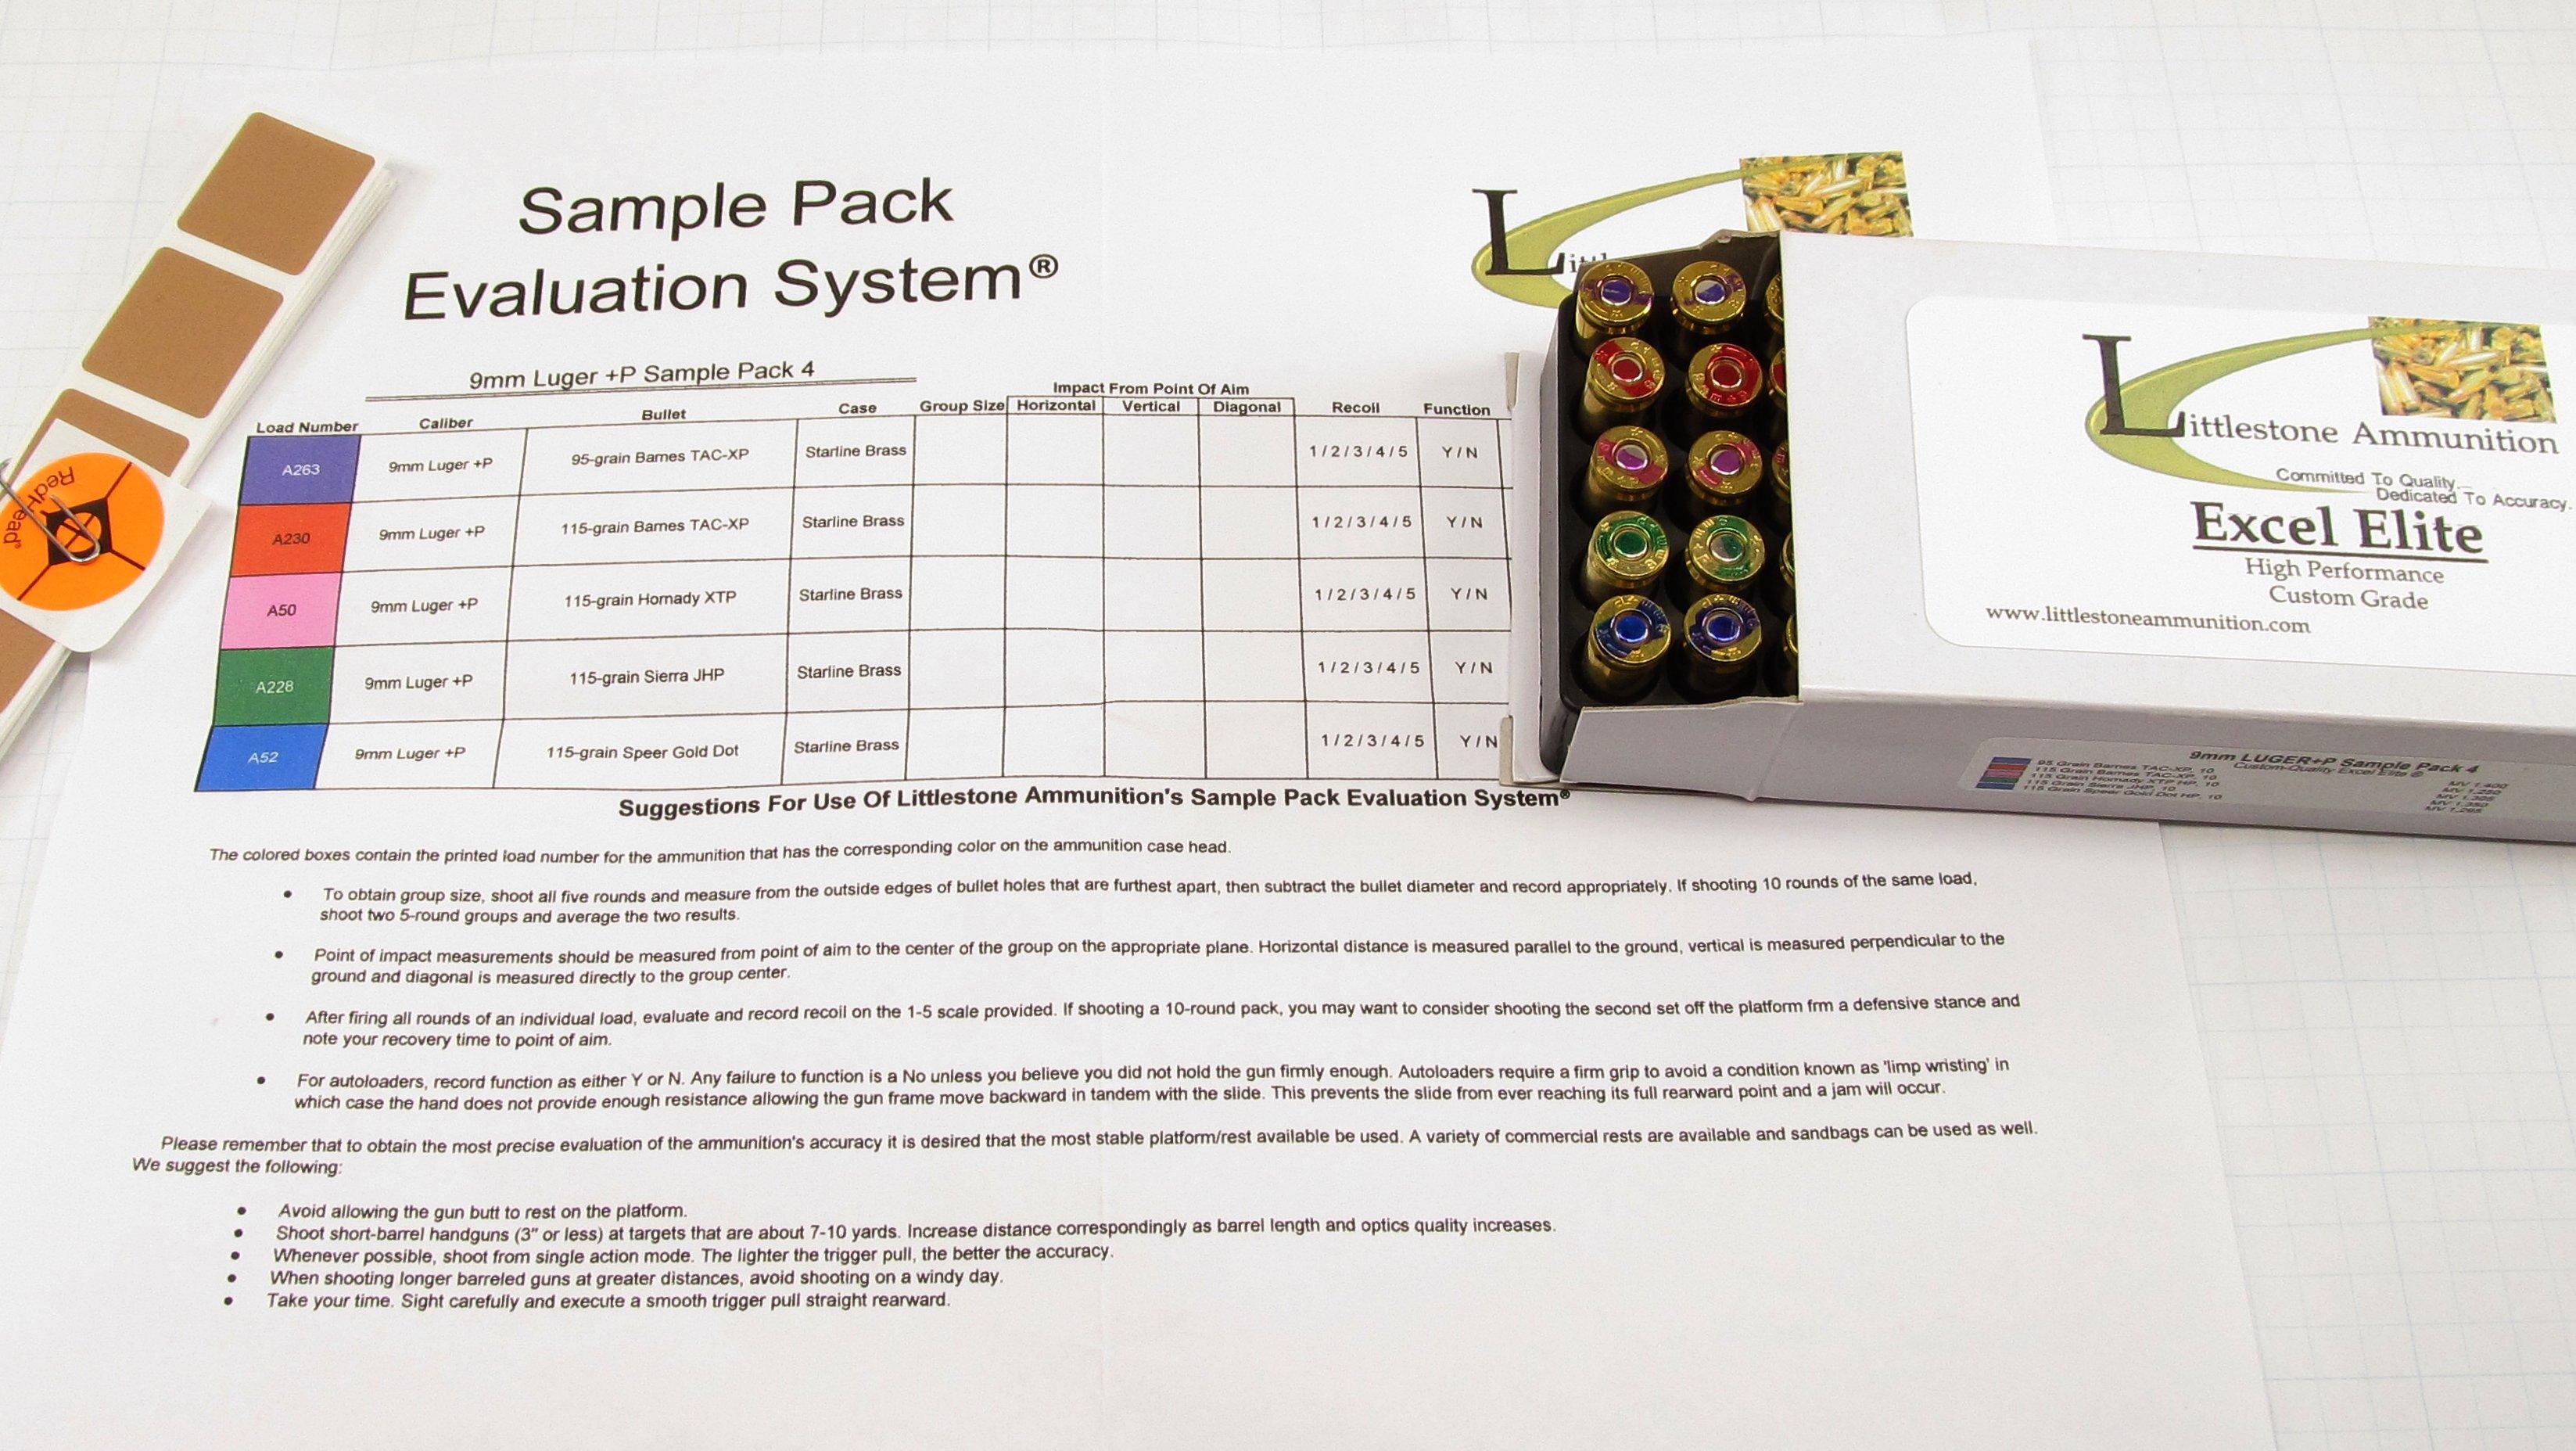 Littlestone Ammunition Sample Pack And Sureshot Review